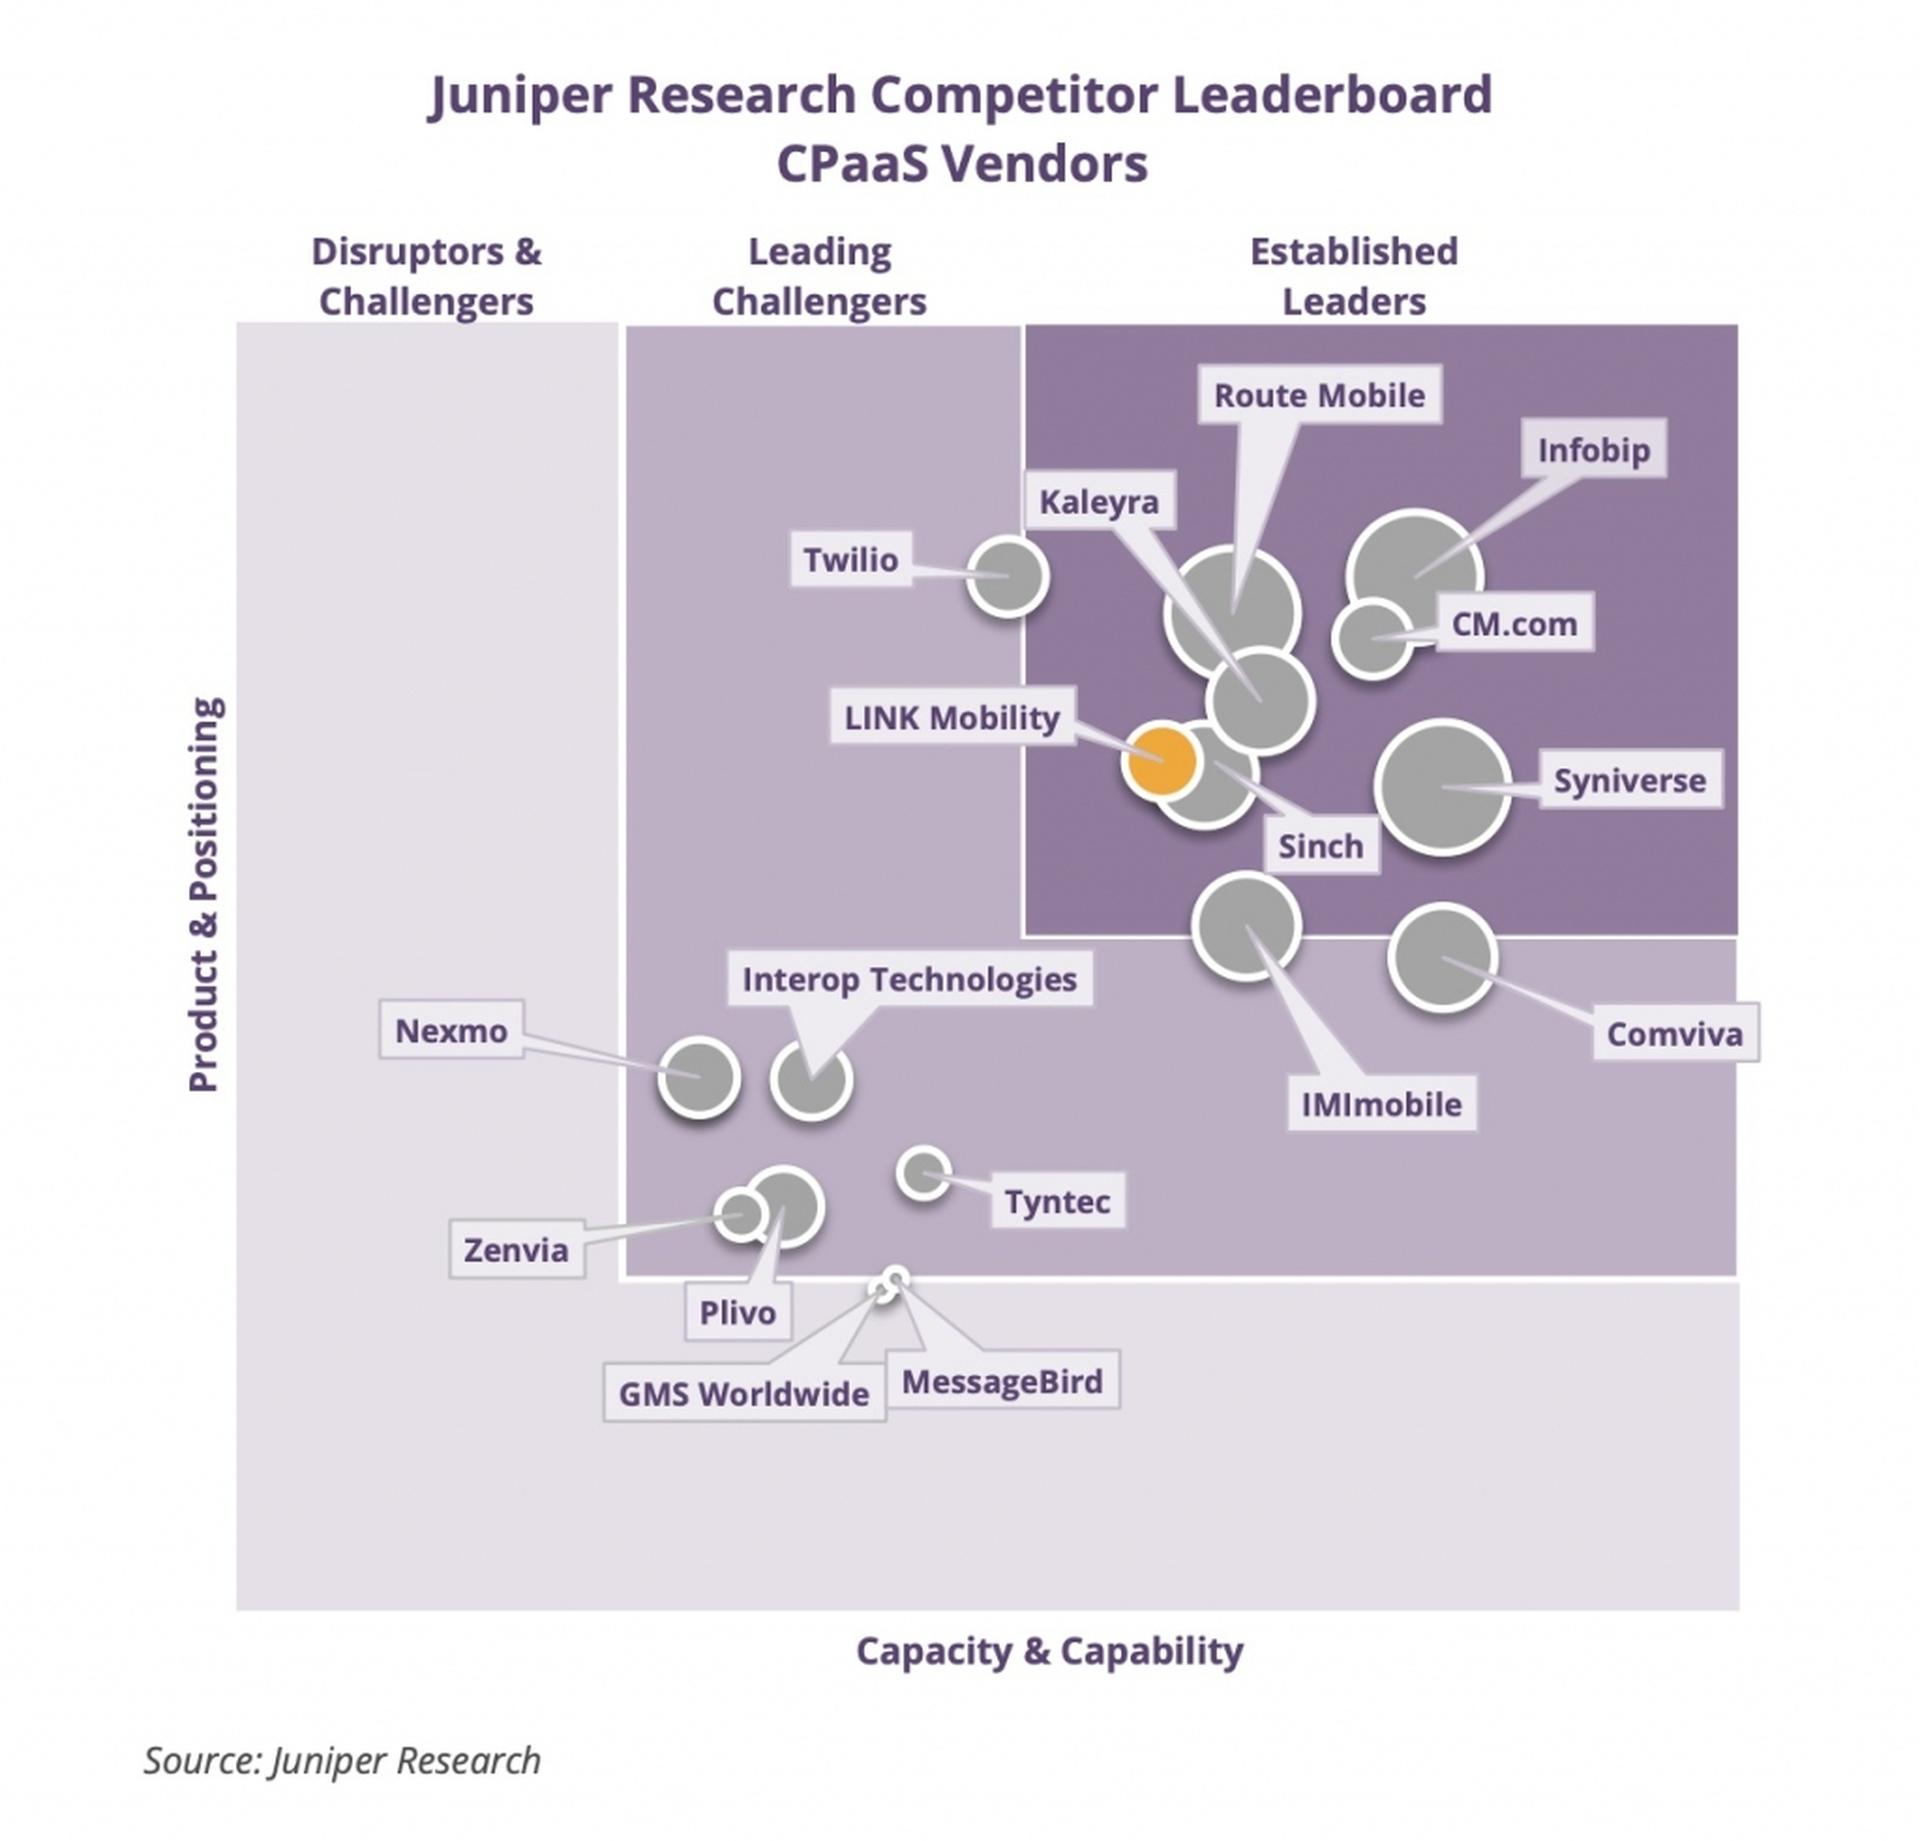 LINK Mobility - Juniper Research Mitbewerber Leaderboard